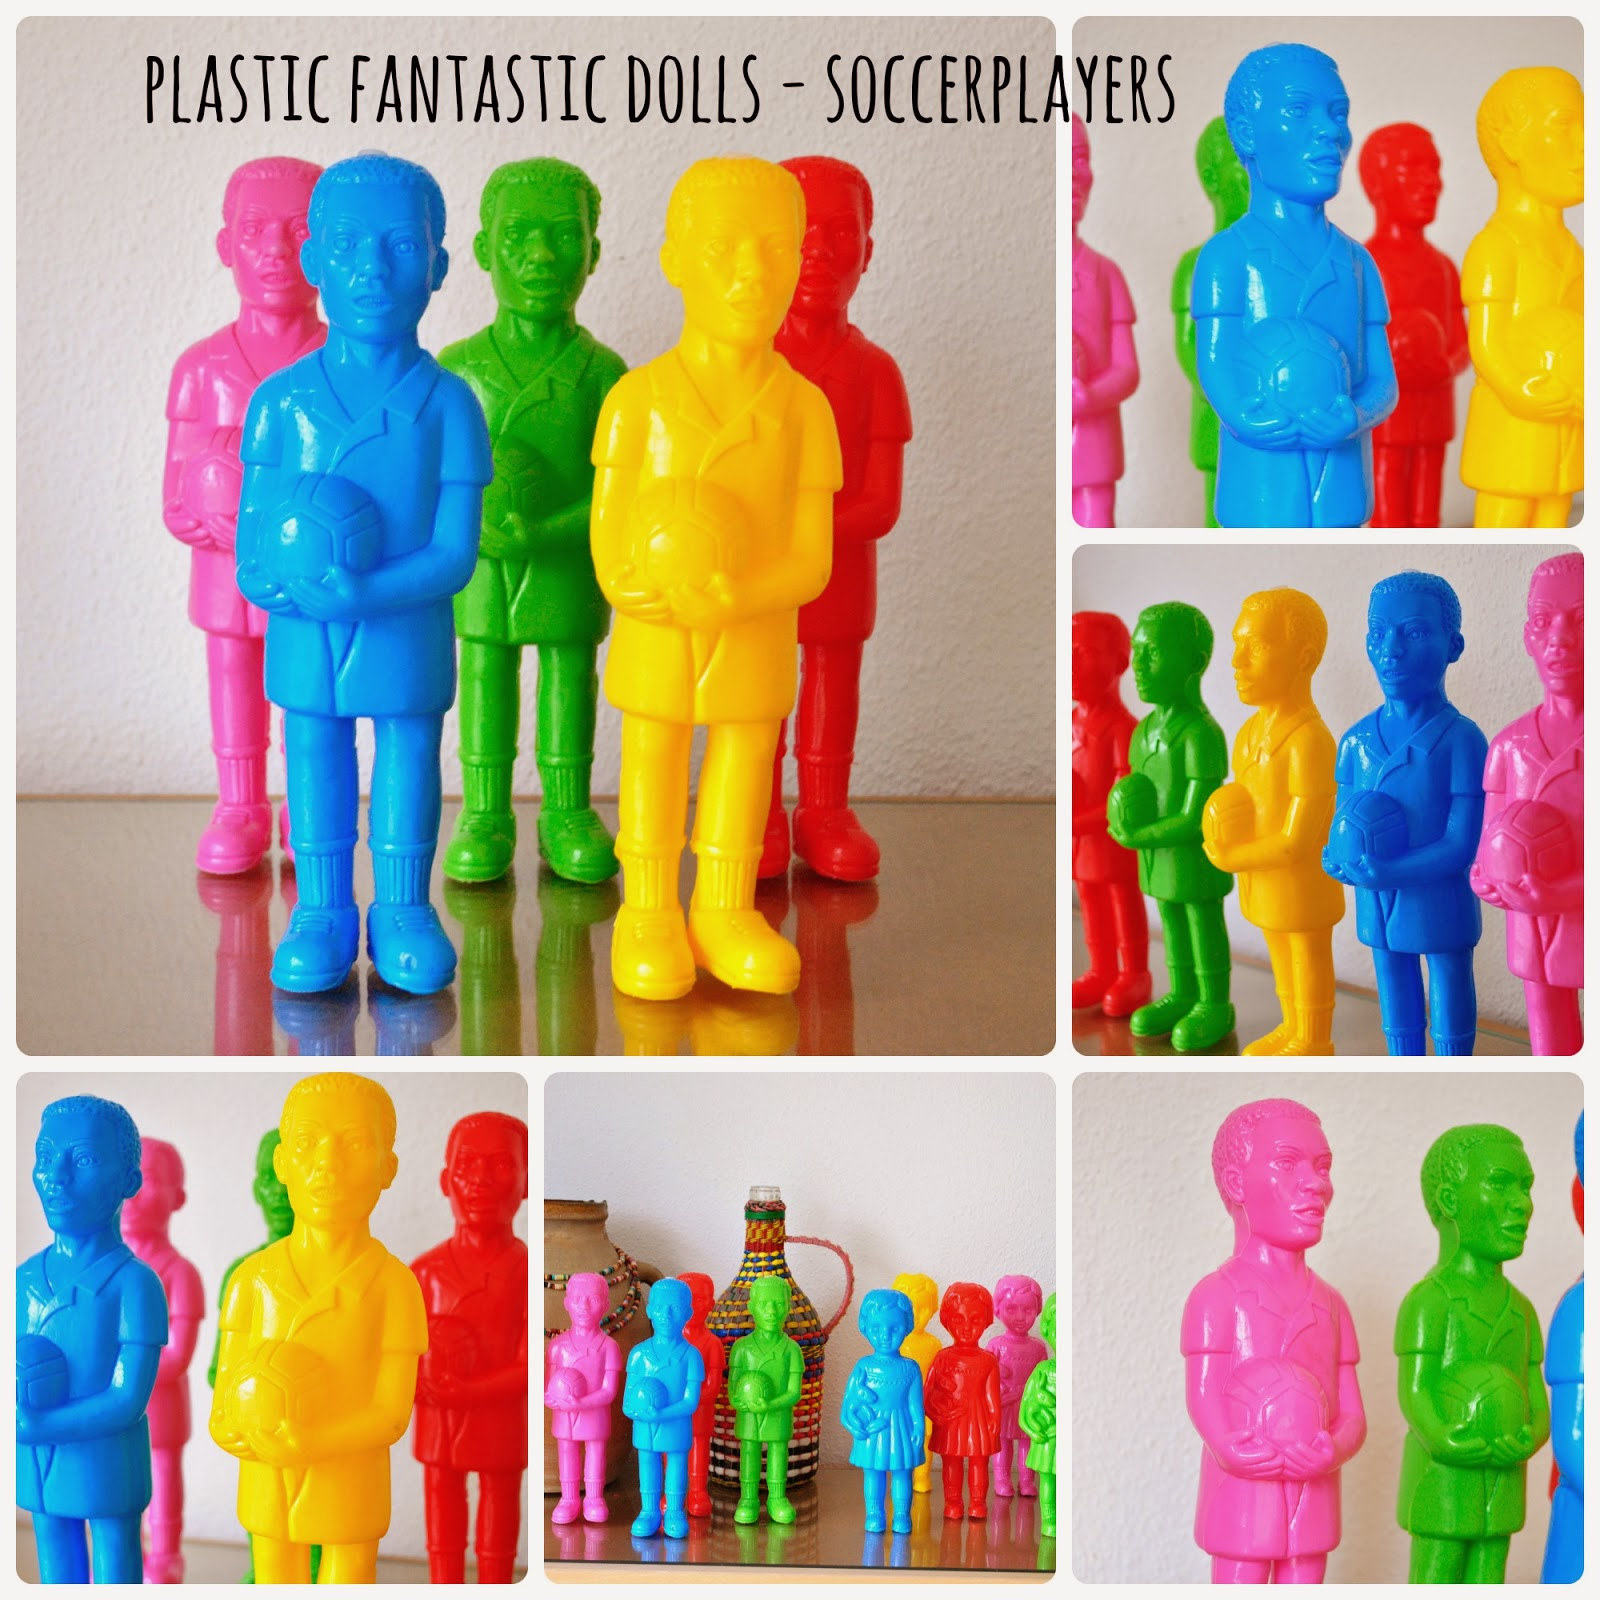 plastic fantastic dolls ohlalahydi